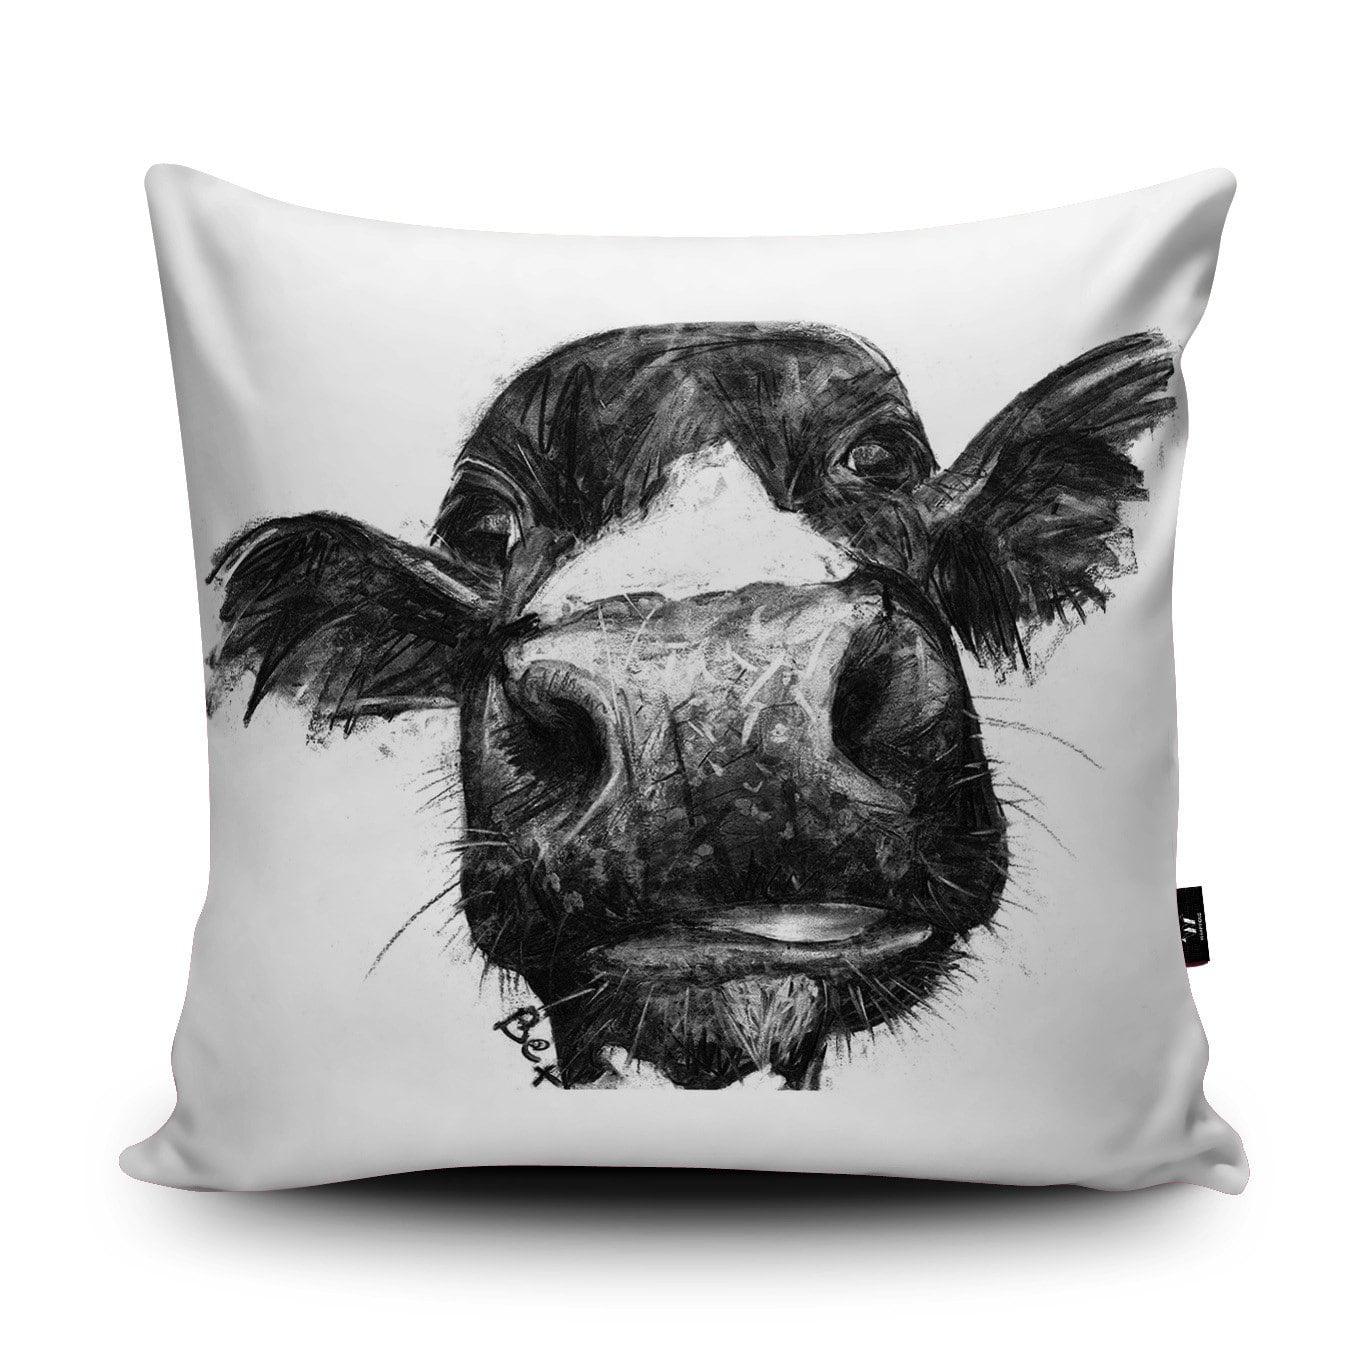 Cow Cushion Cow Pillow Farm Animal Cushion Black White Cow Illustration Bedding